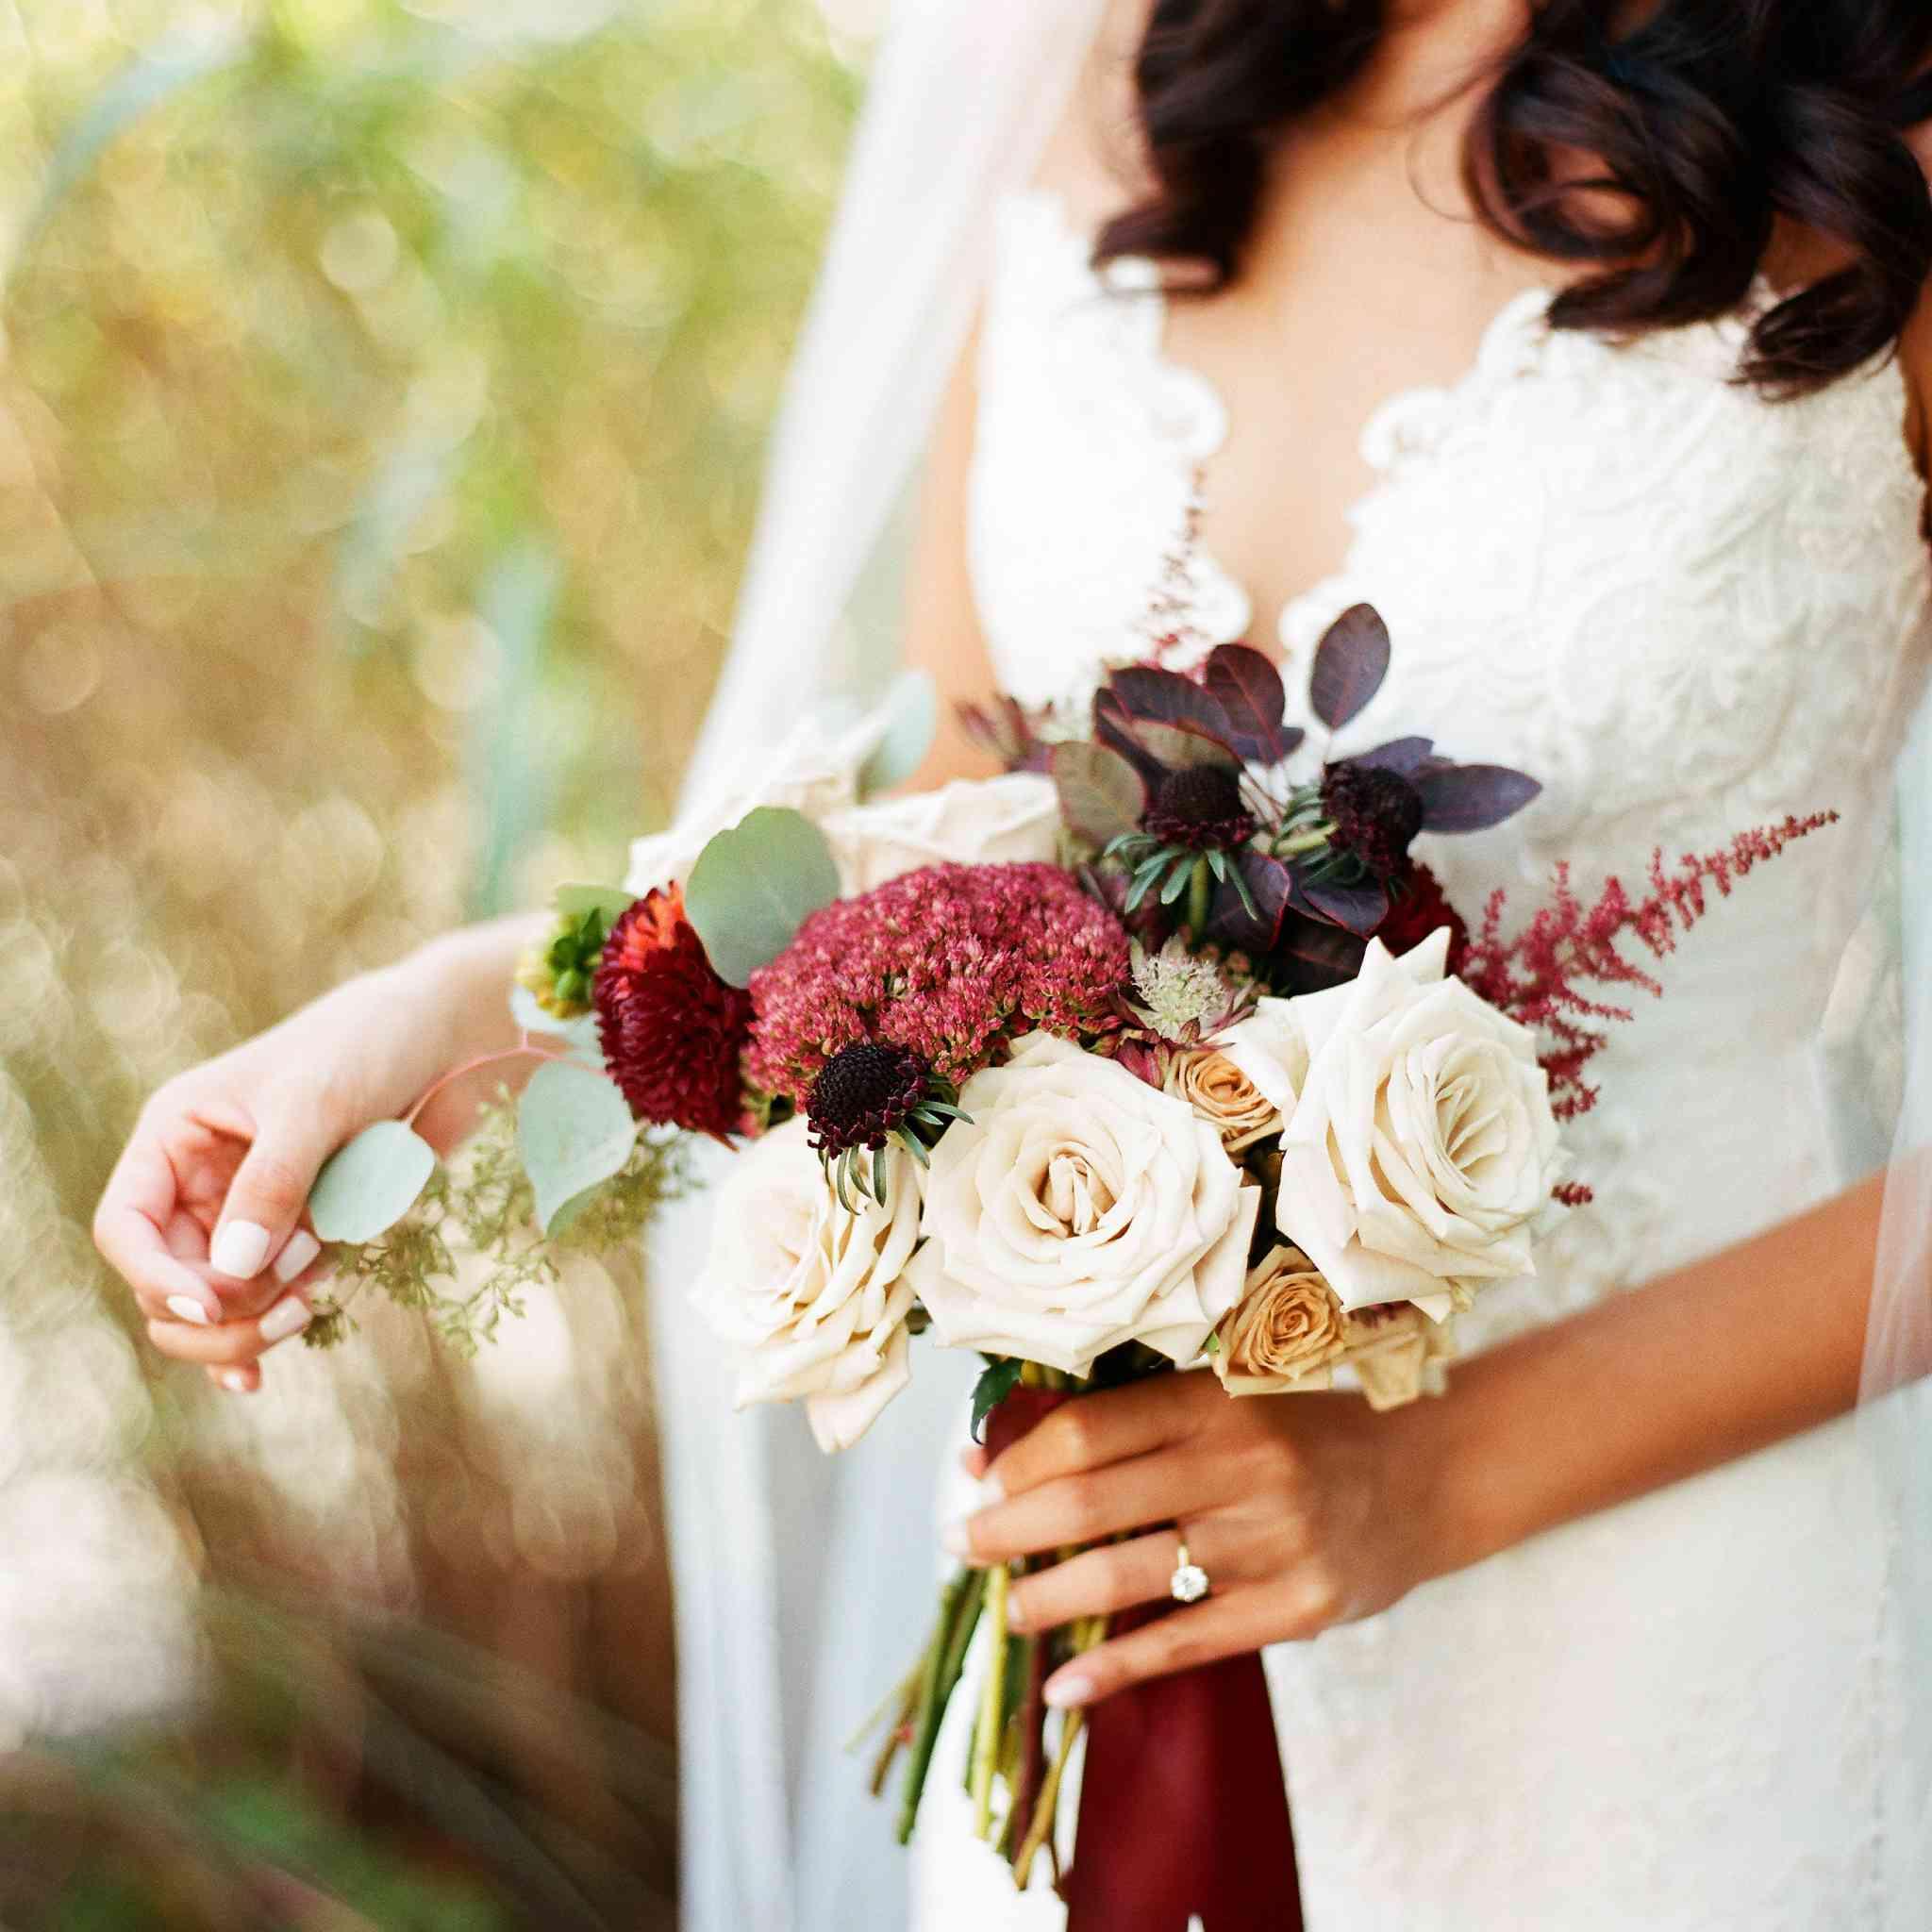 <p>bride's fall bouquet</p><br><br>